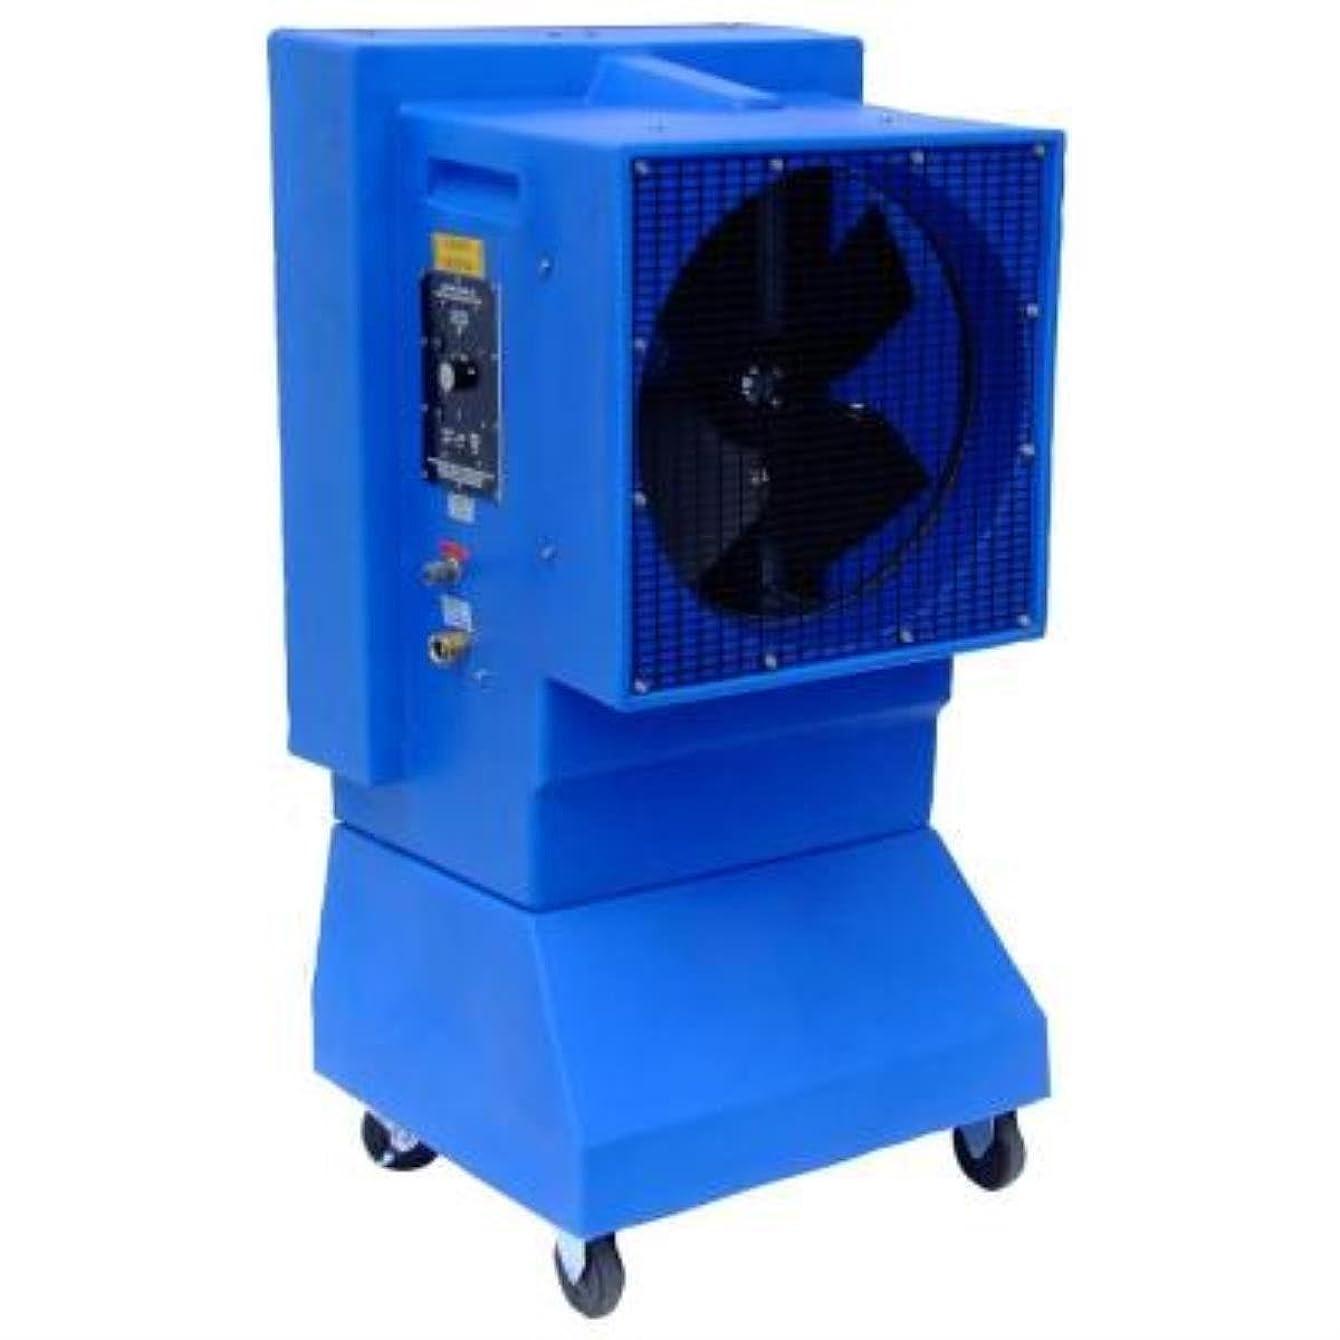 Maxxair EC18DVS Variable Speed Portable Evaporative Cooler, 110V